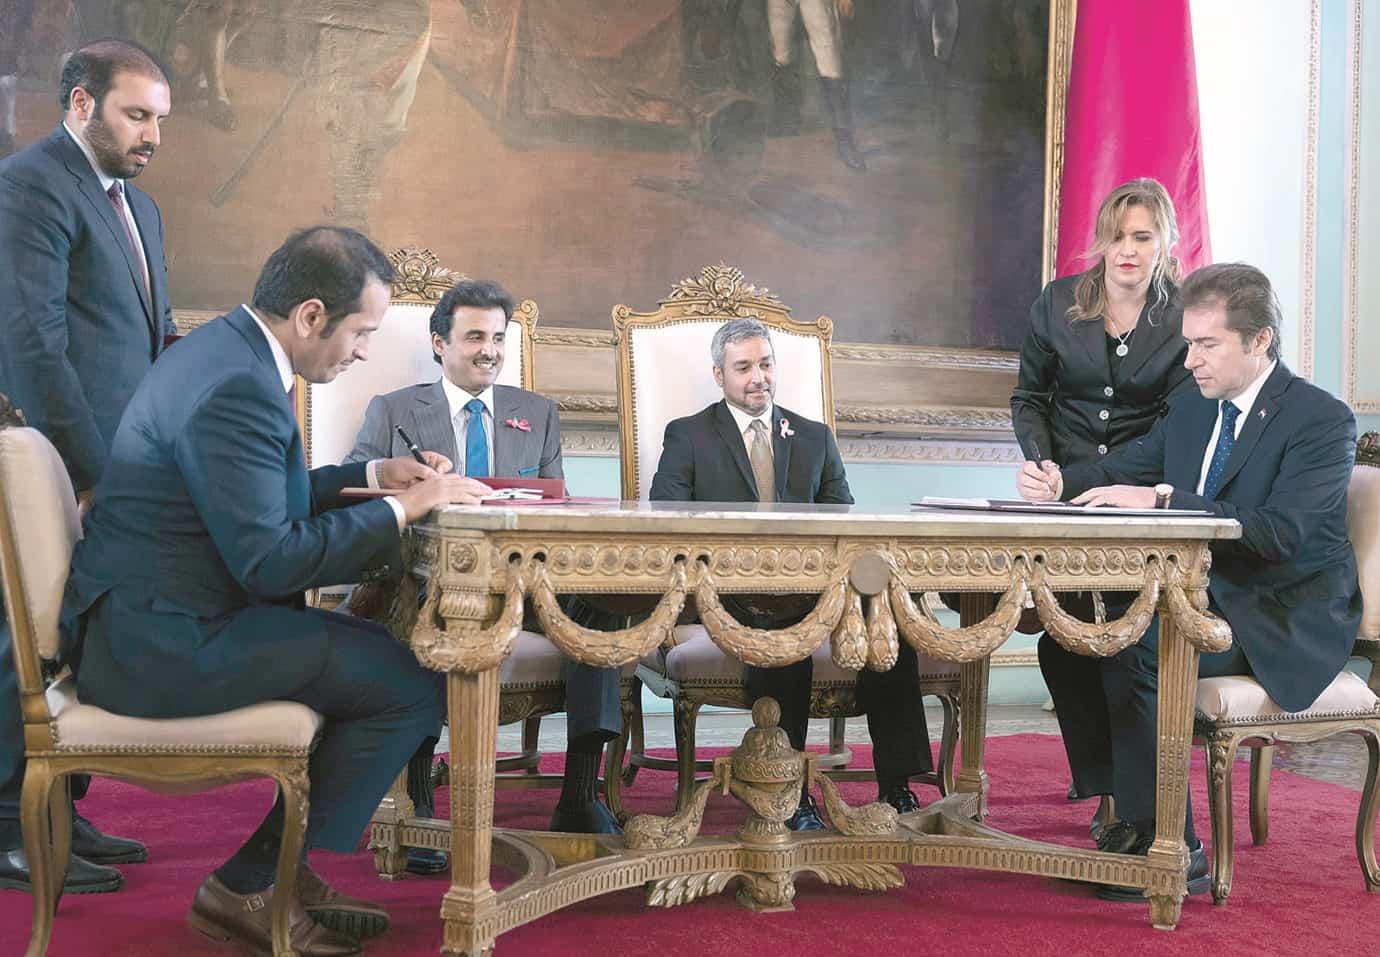 Qatar and Peru sign several agreements